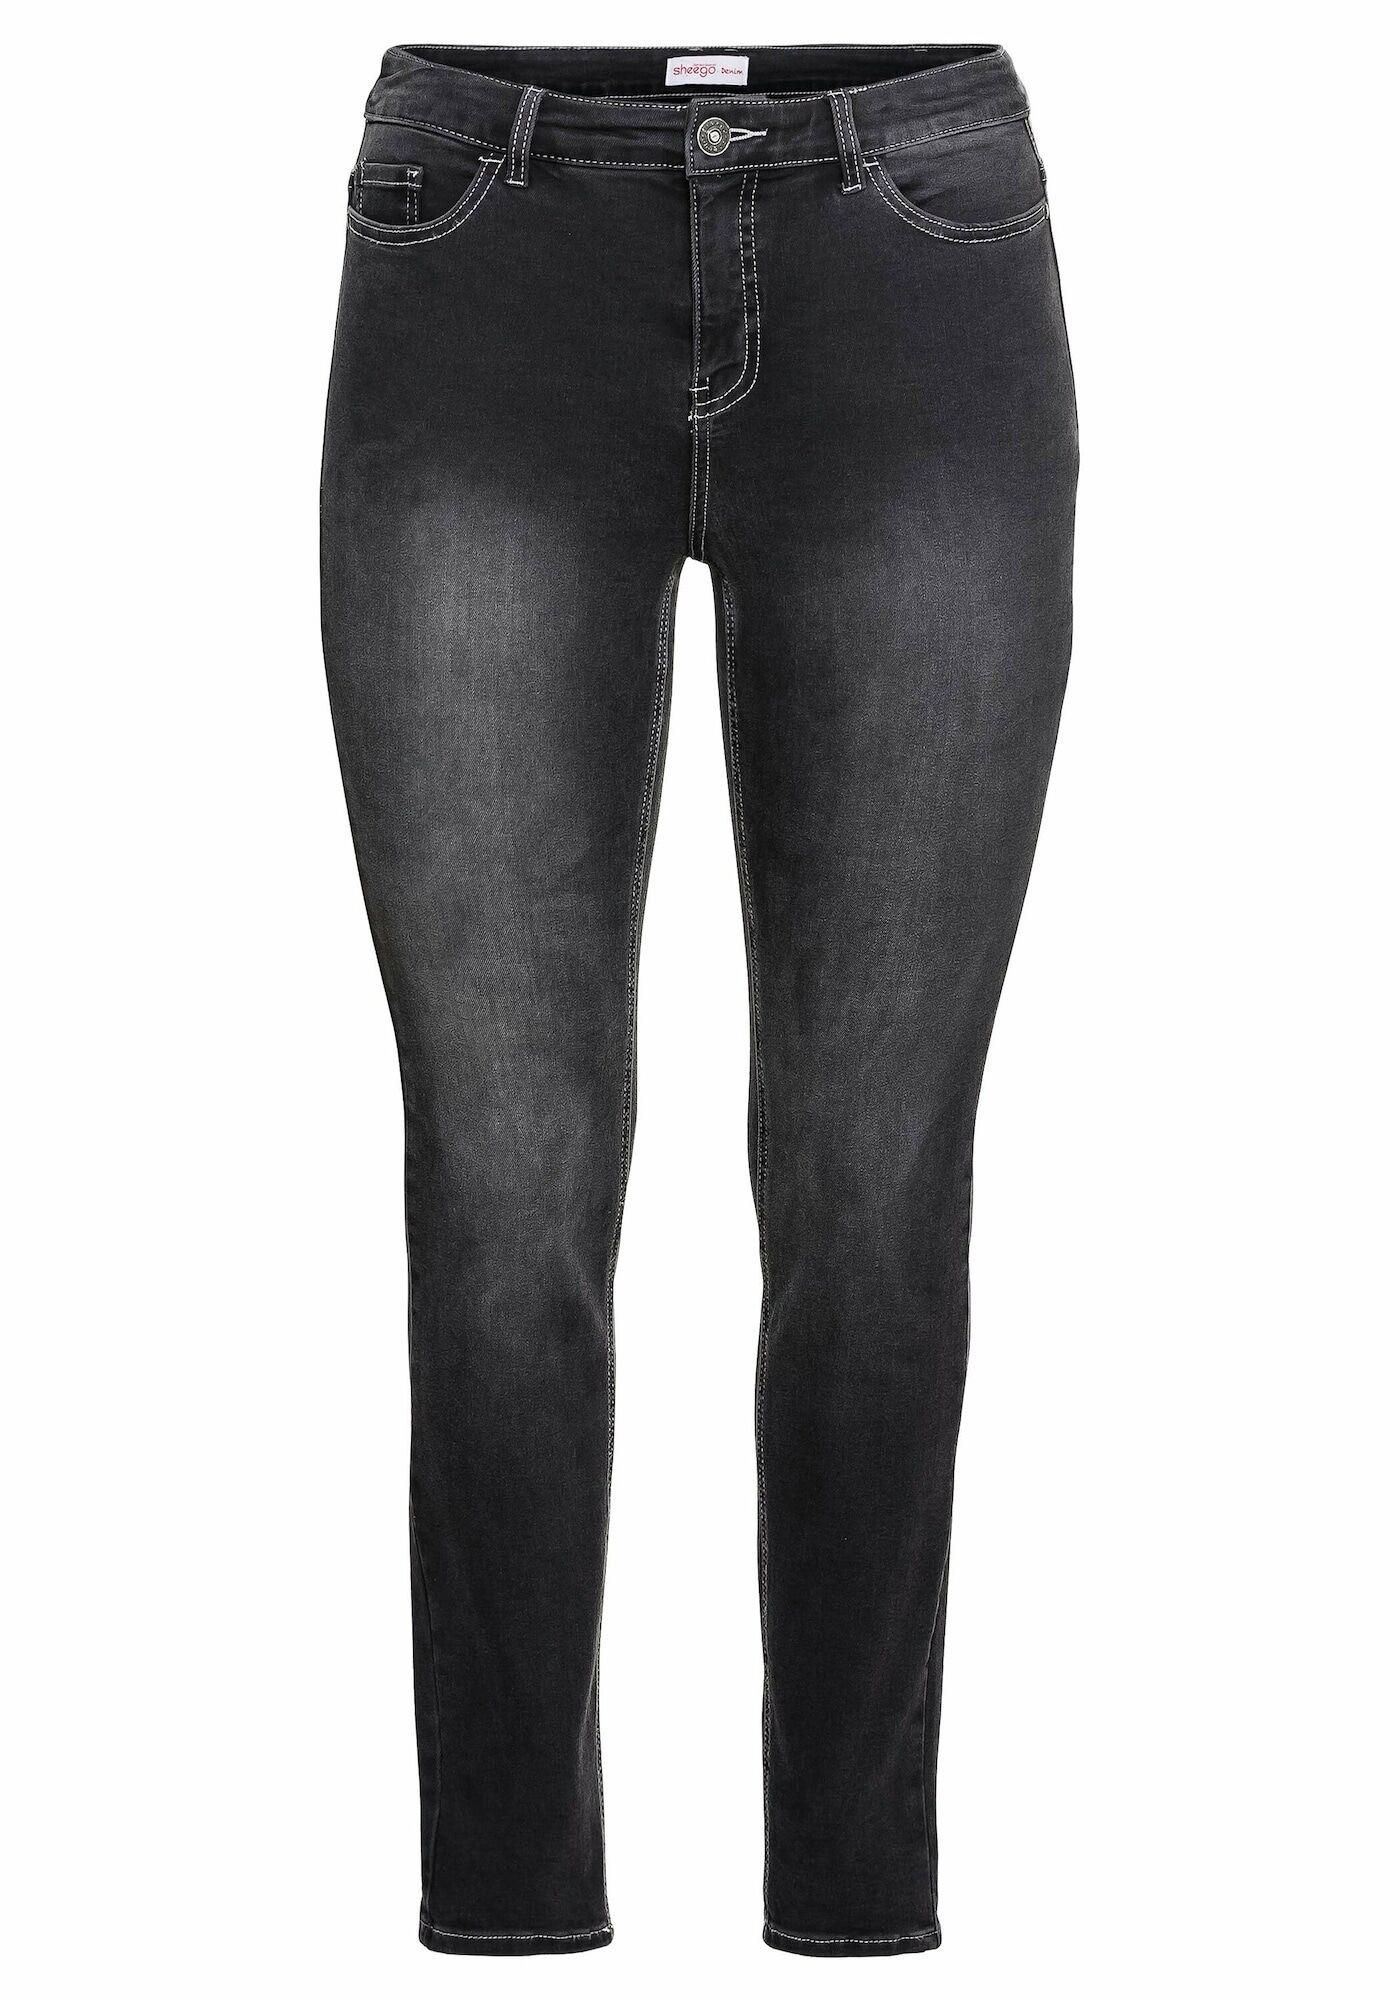 SHEEGO Jean  - Noir - Taille: 54 - female